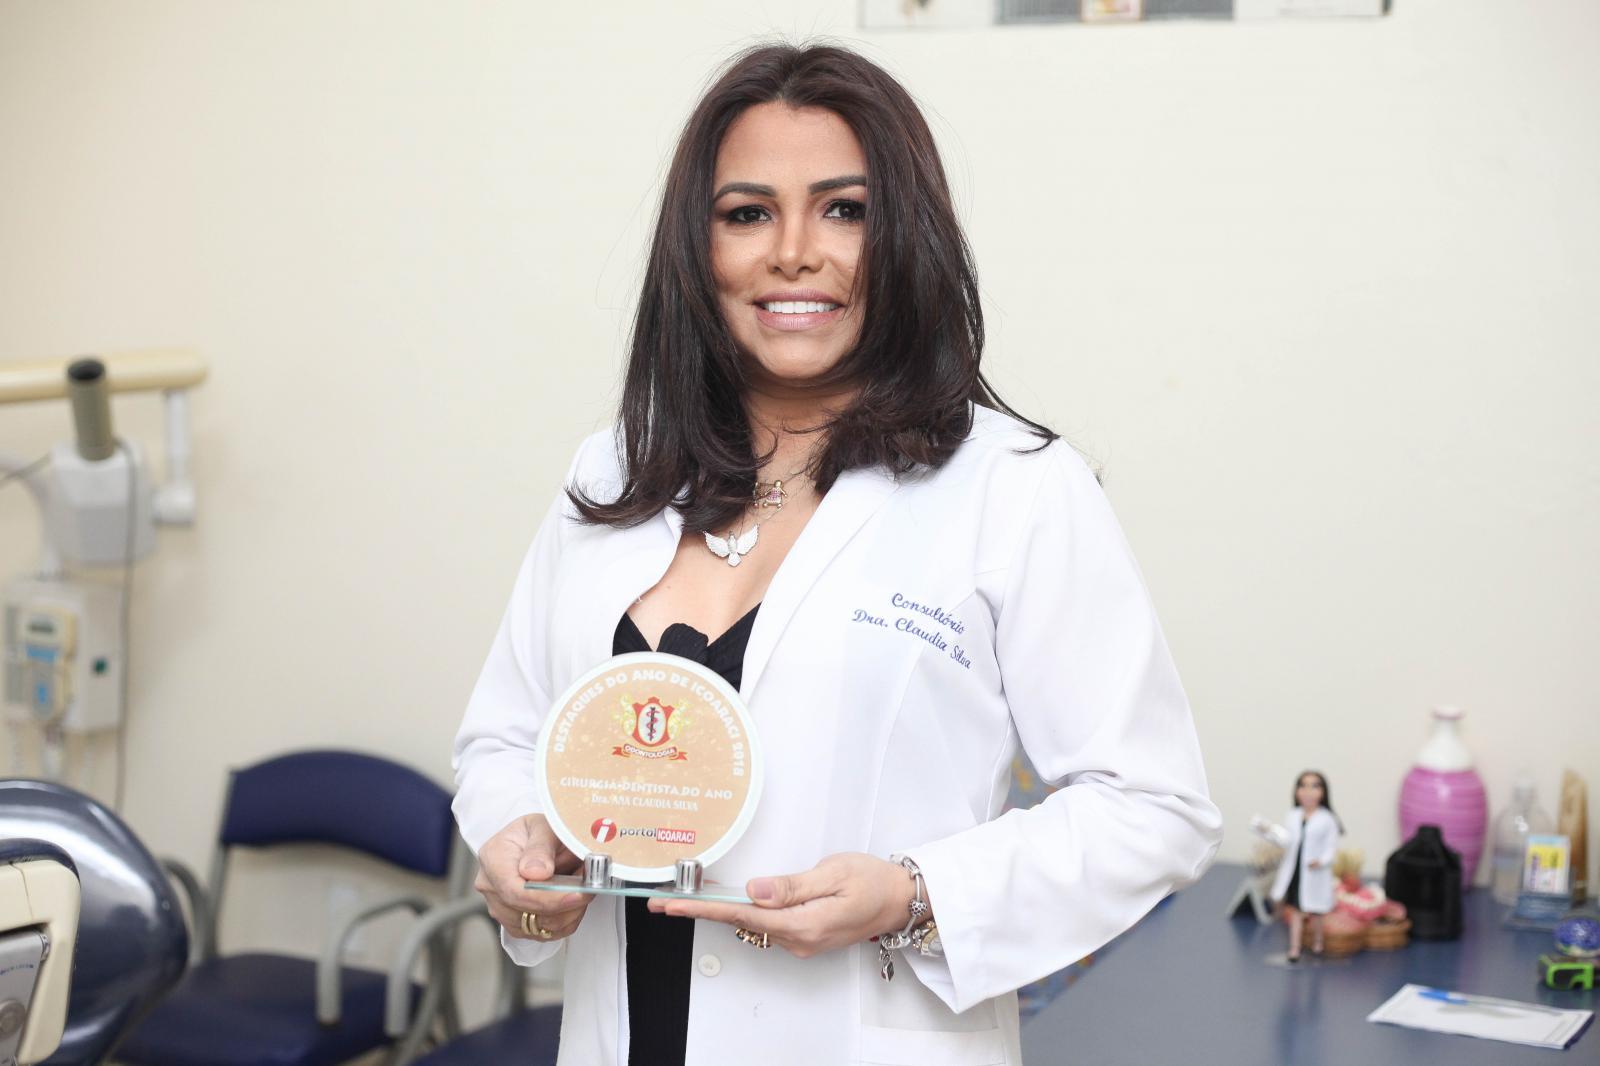 Dra Ana Claudia Silva - Cirurgiã Dentista do Ano de Icoaraci